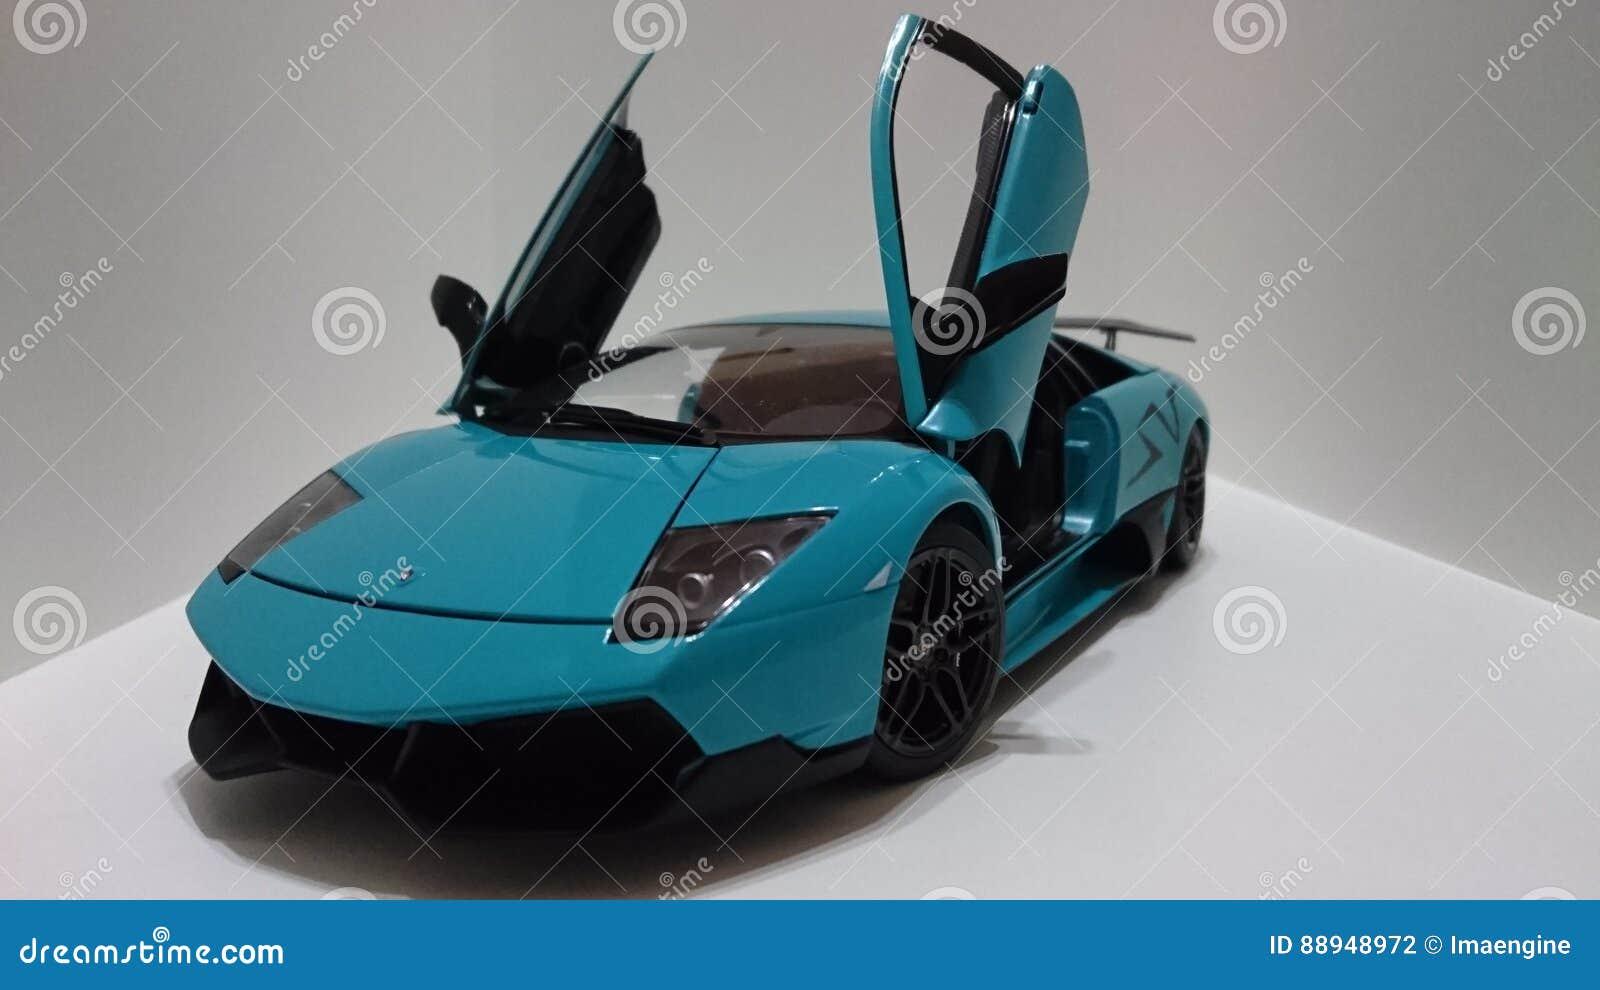 Lamborghini Murcielago Sv Superveloce Italian Sports Car Editorial